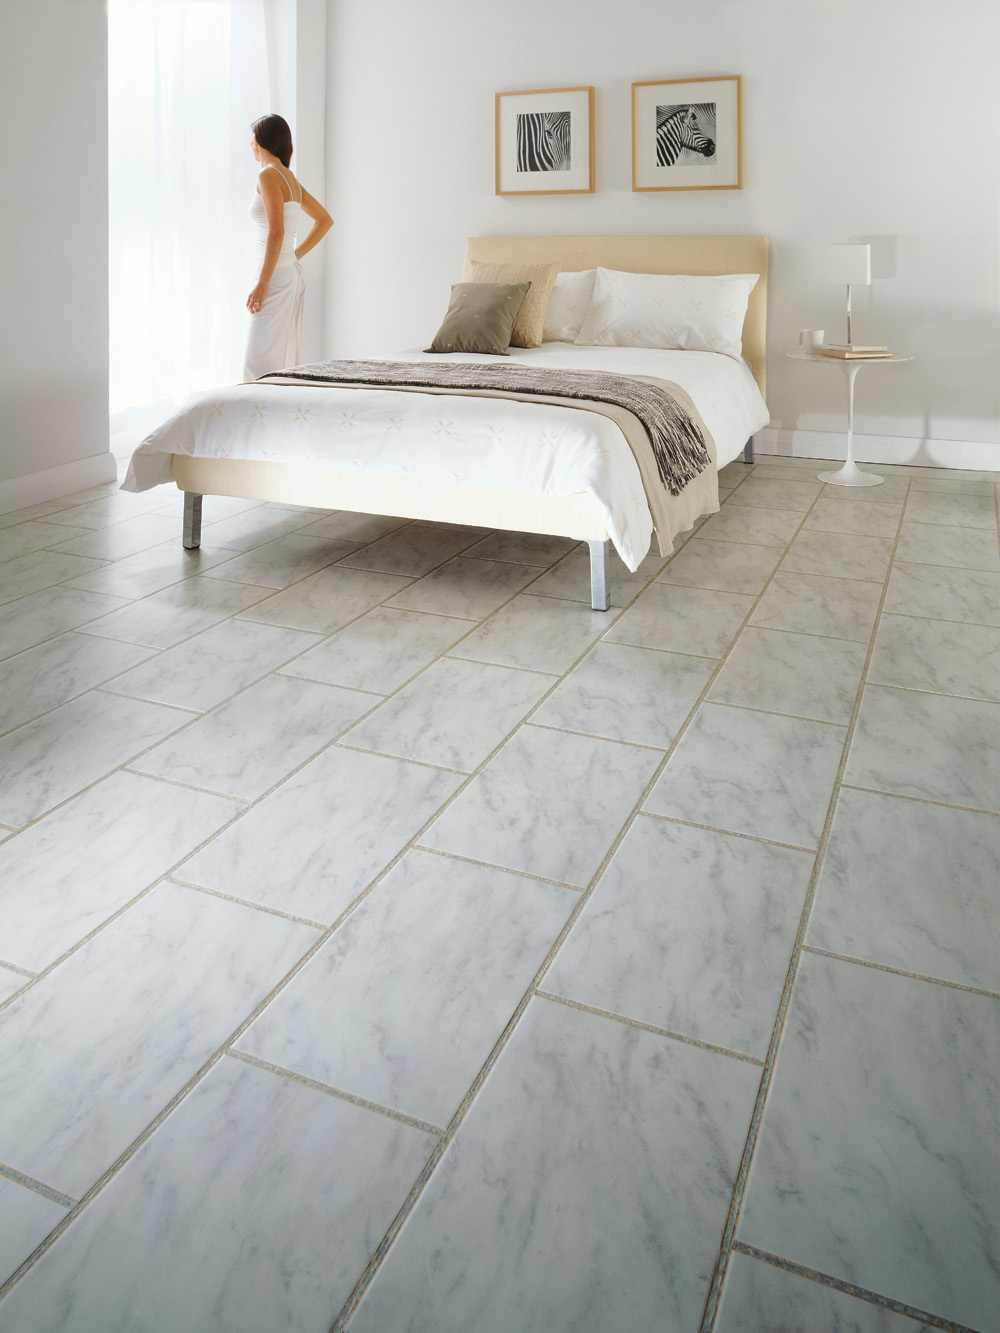 Bedroom carpets uk